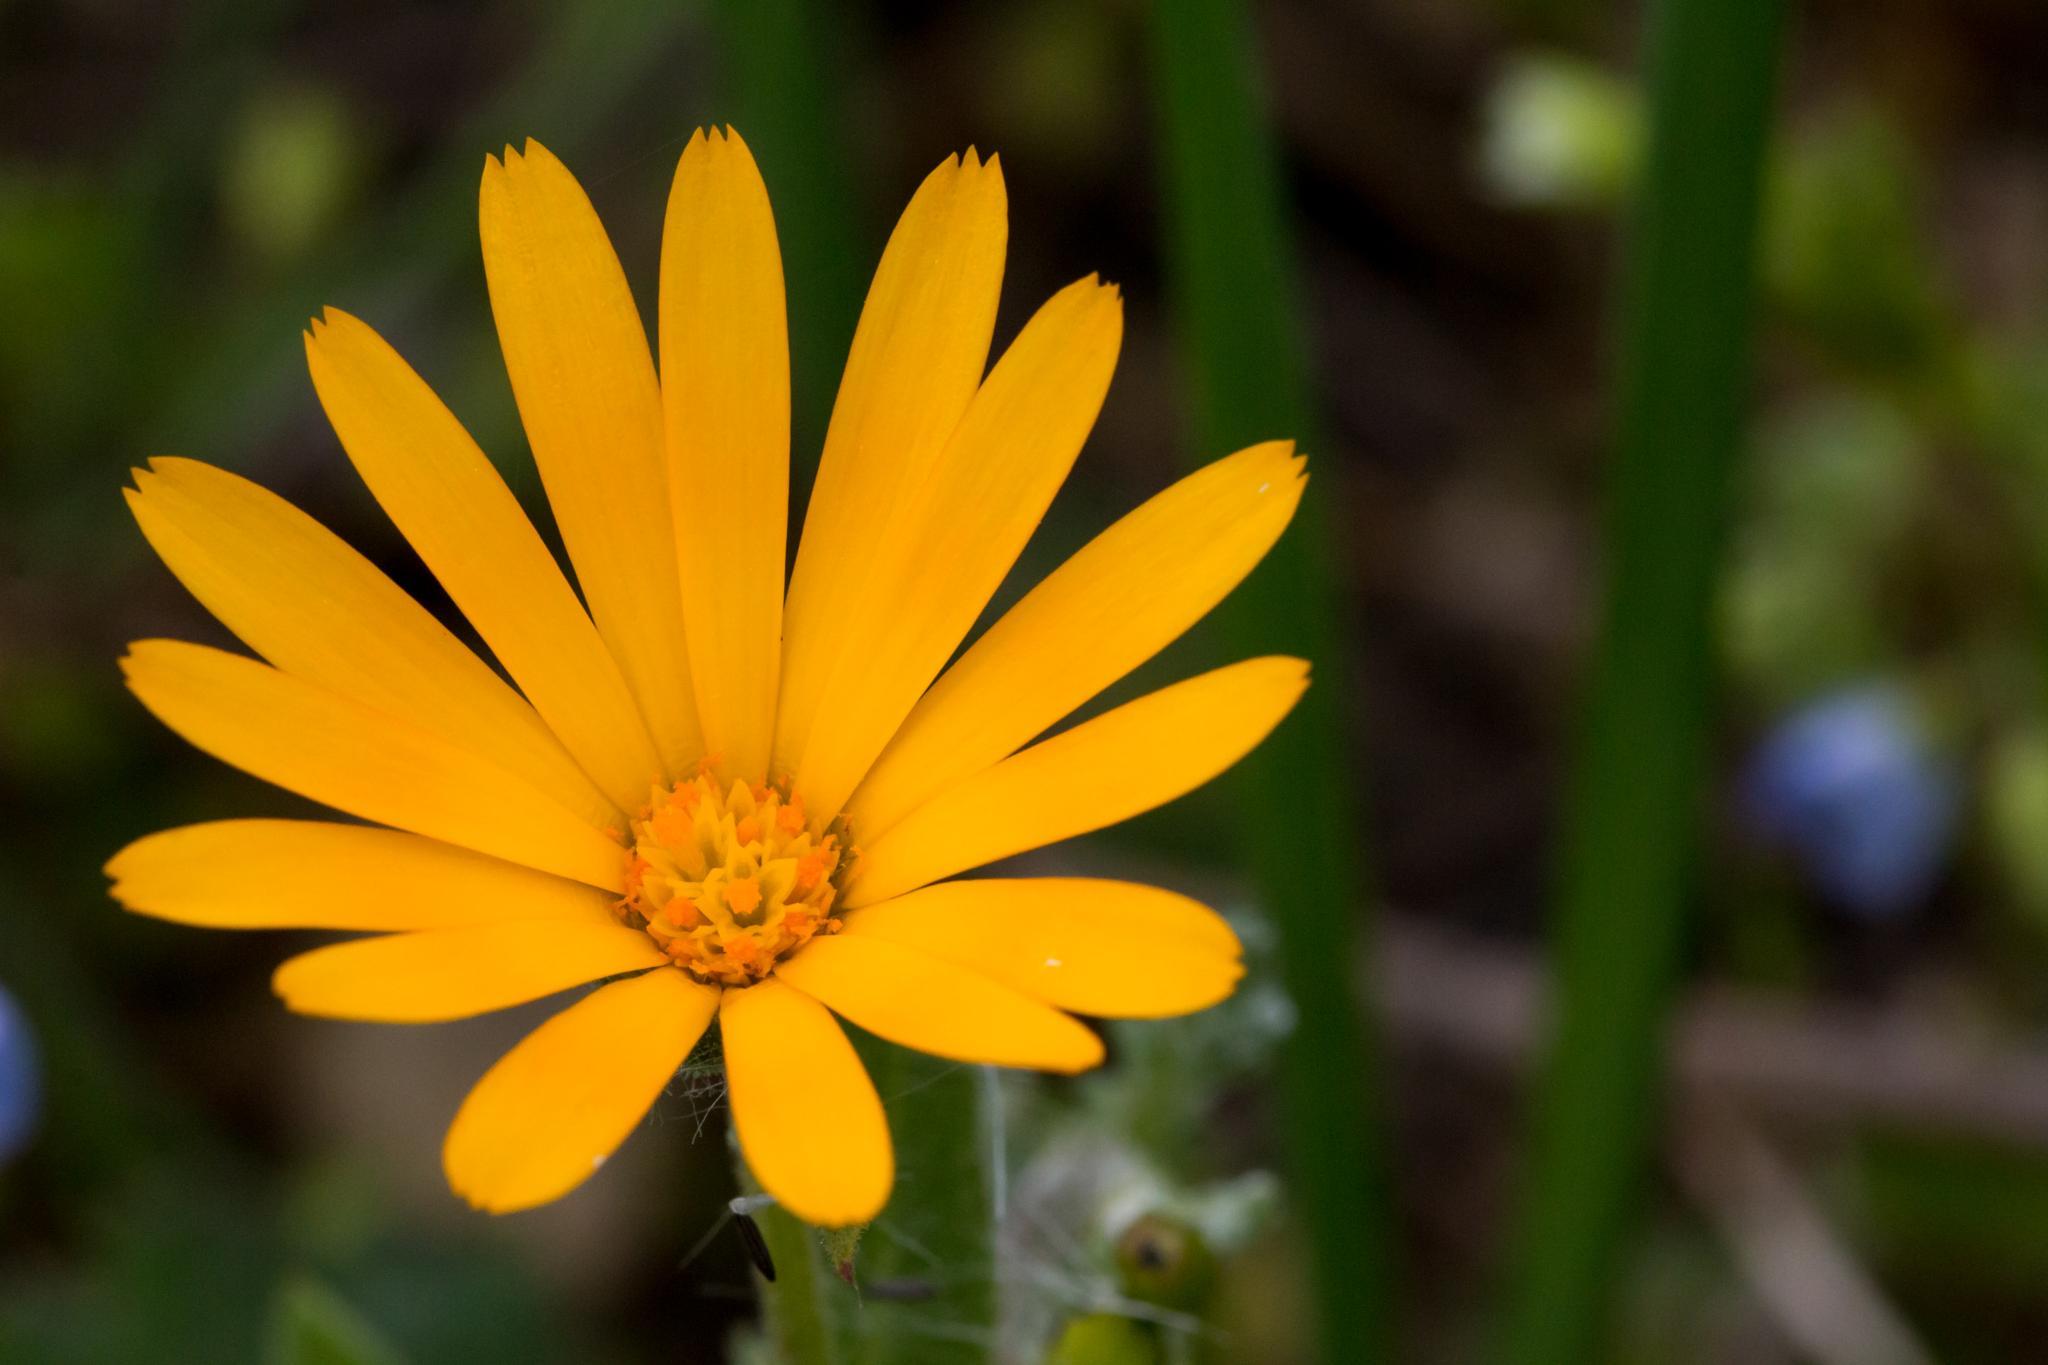 Souci des champs (Calendula arvensis) by FRA298